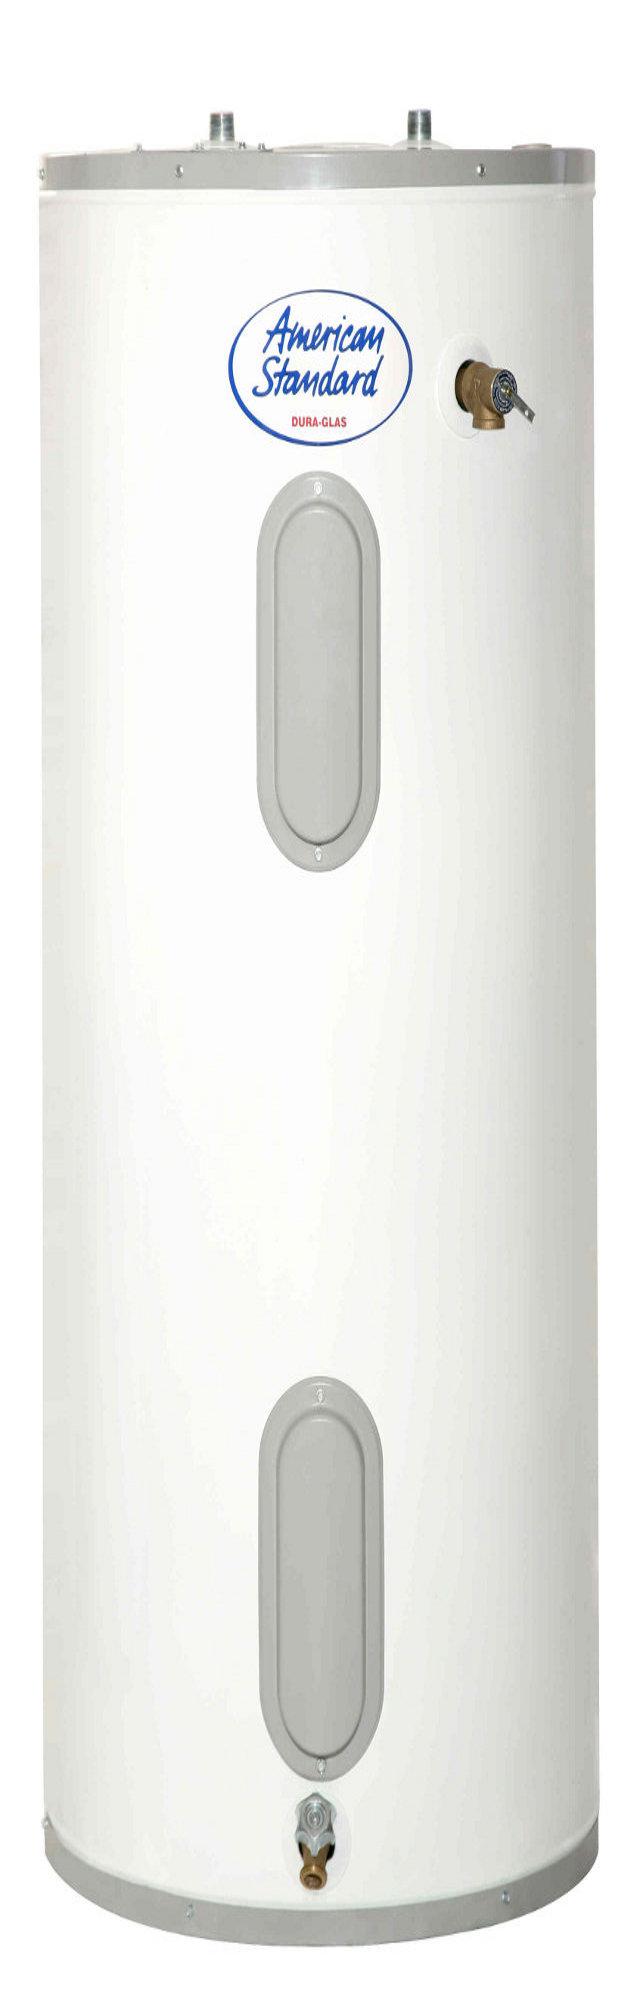 American Water Heater Distributors Facias